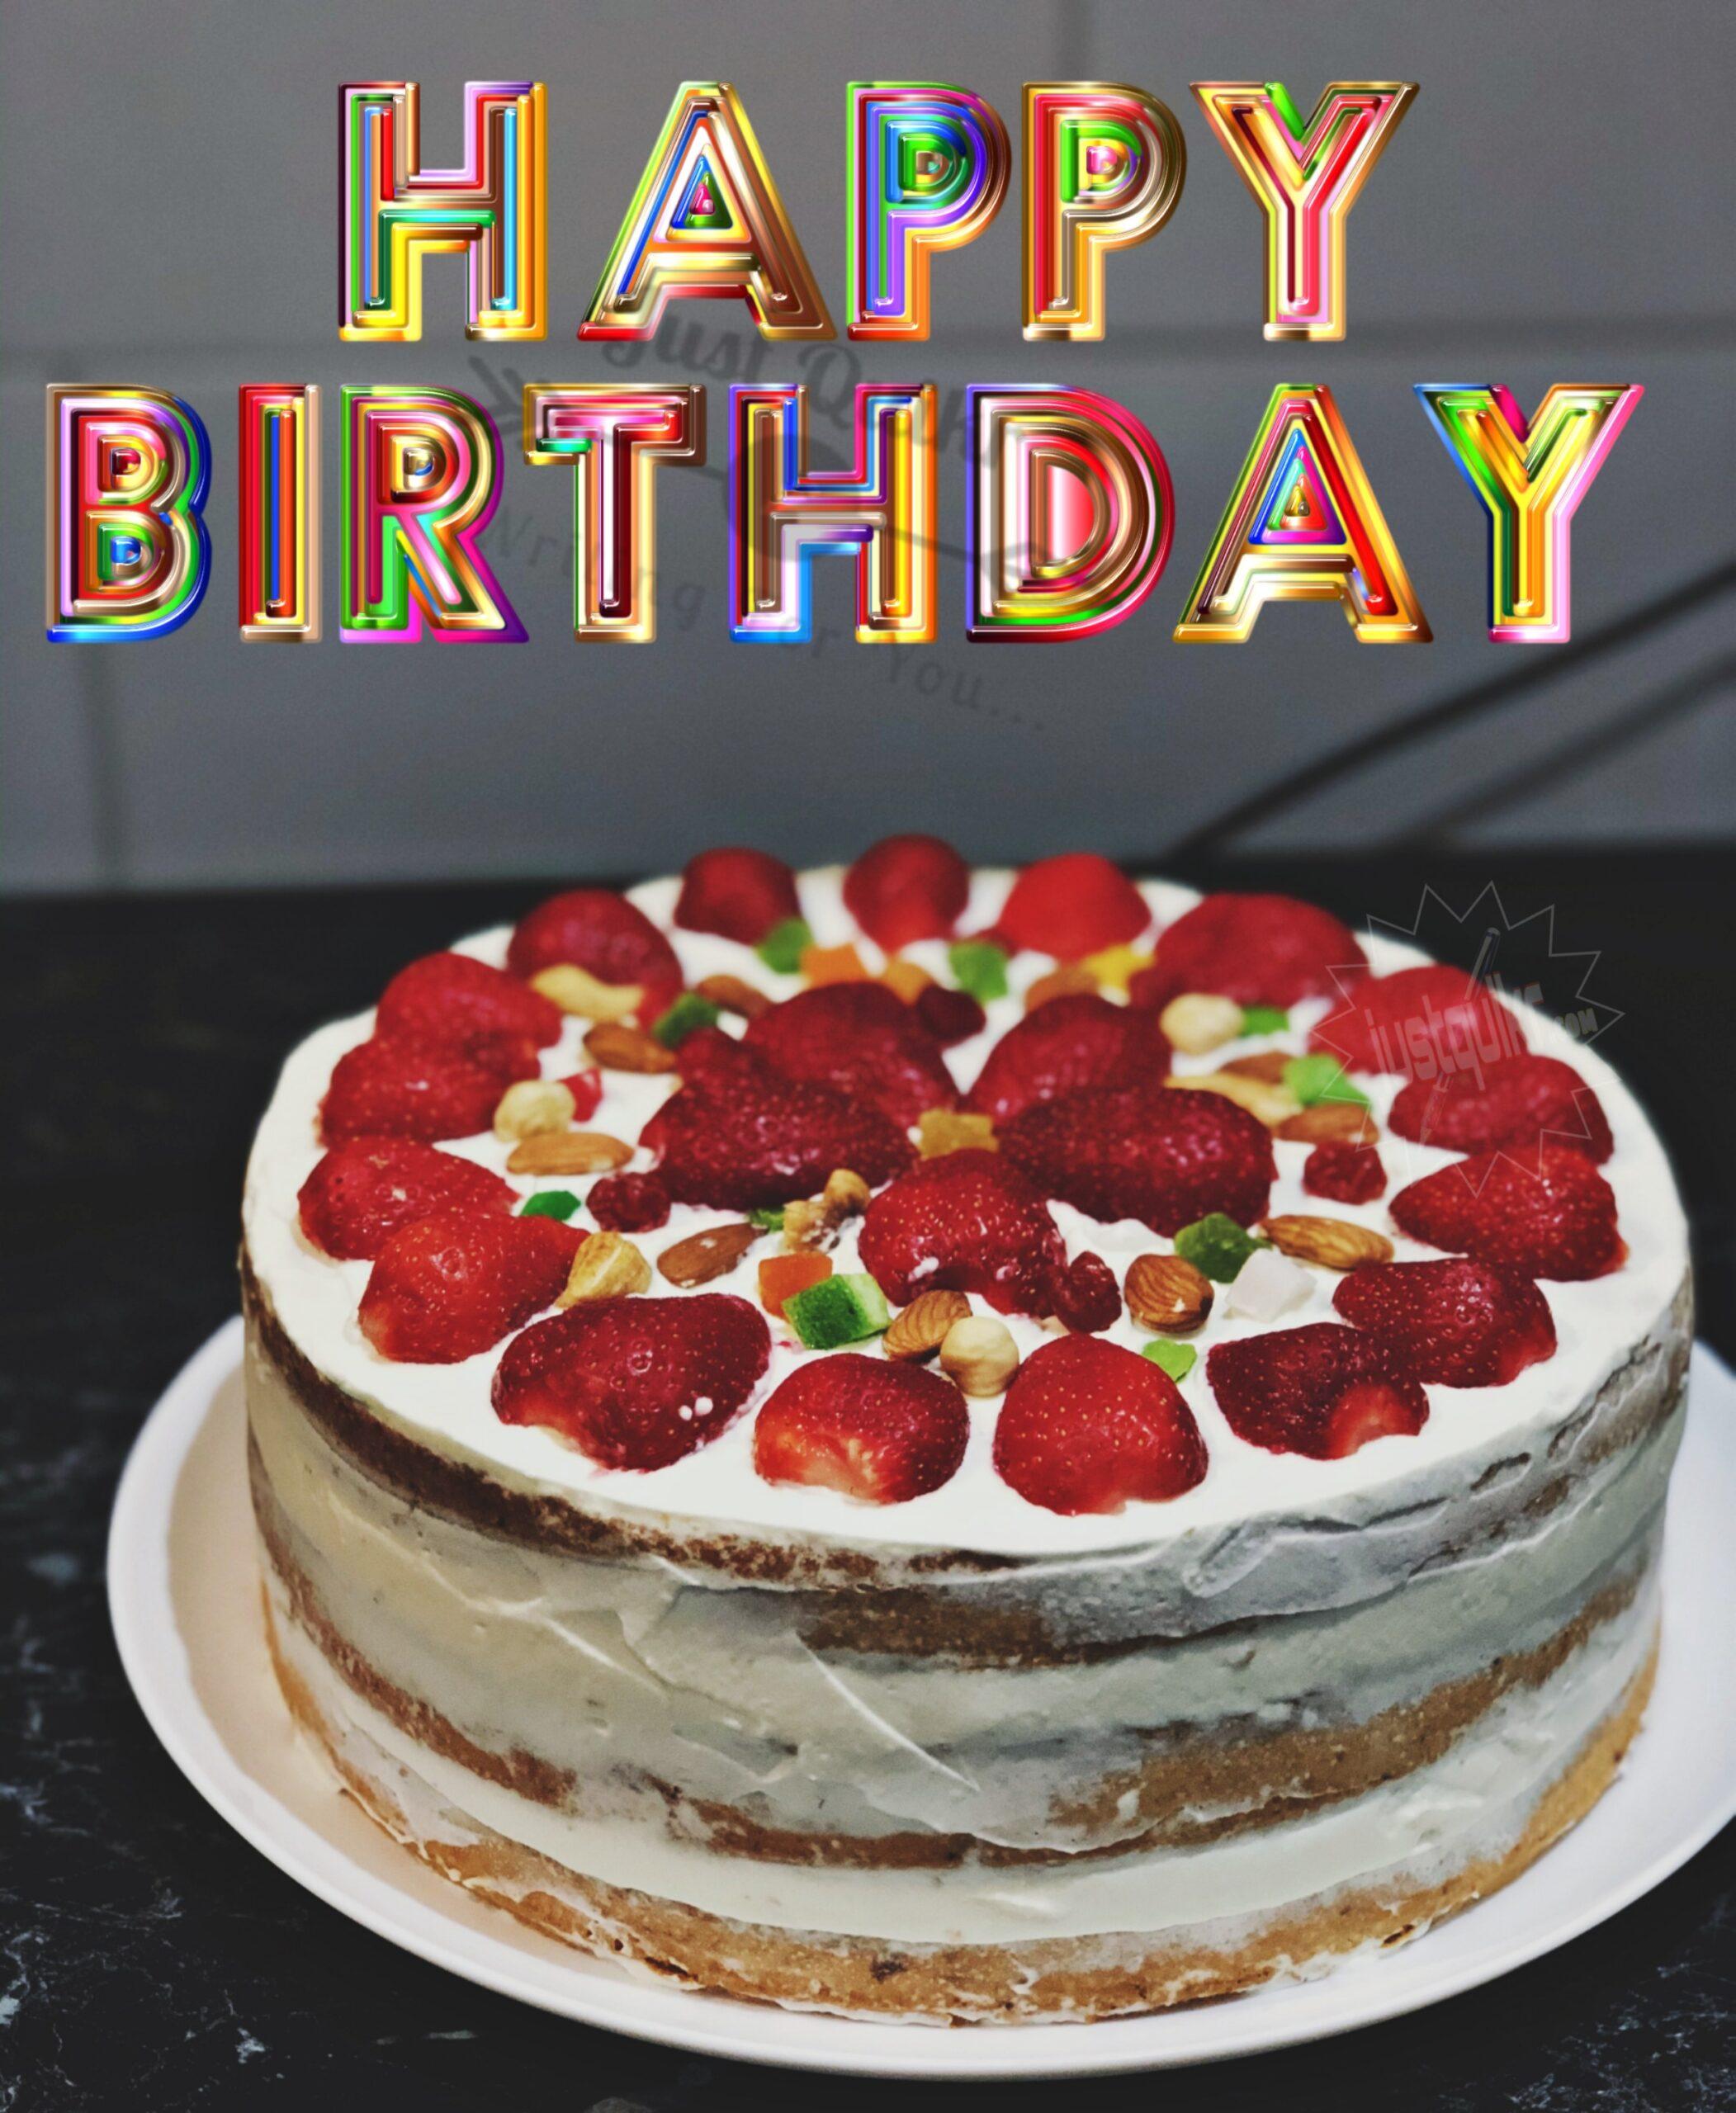 CreativeHappy Birthday Wishing Cake Status Images for Jaan